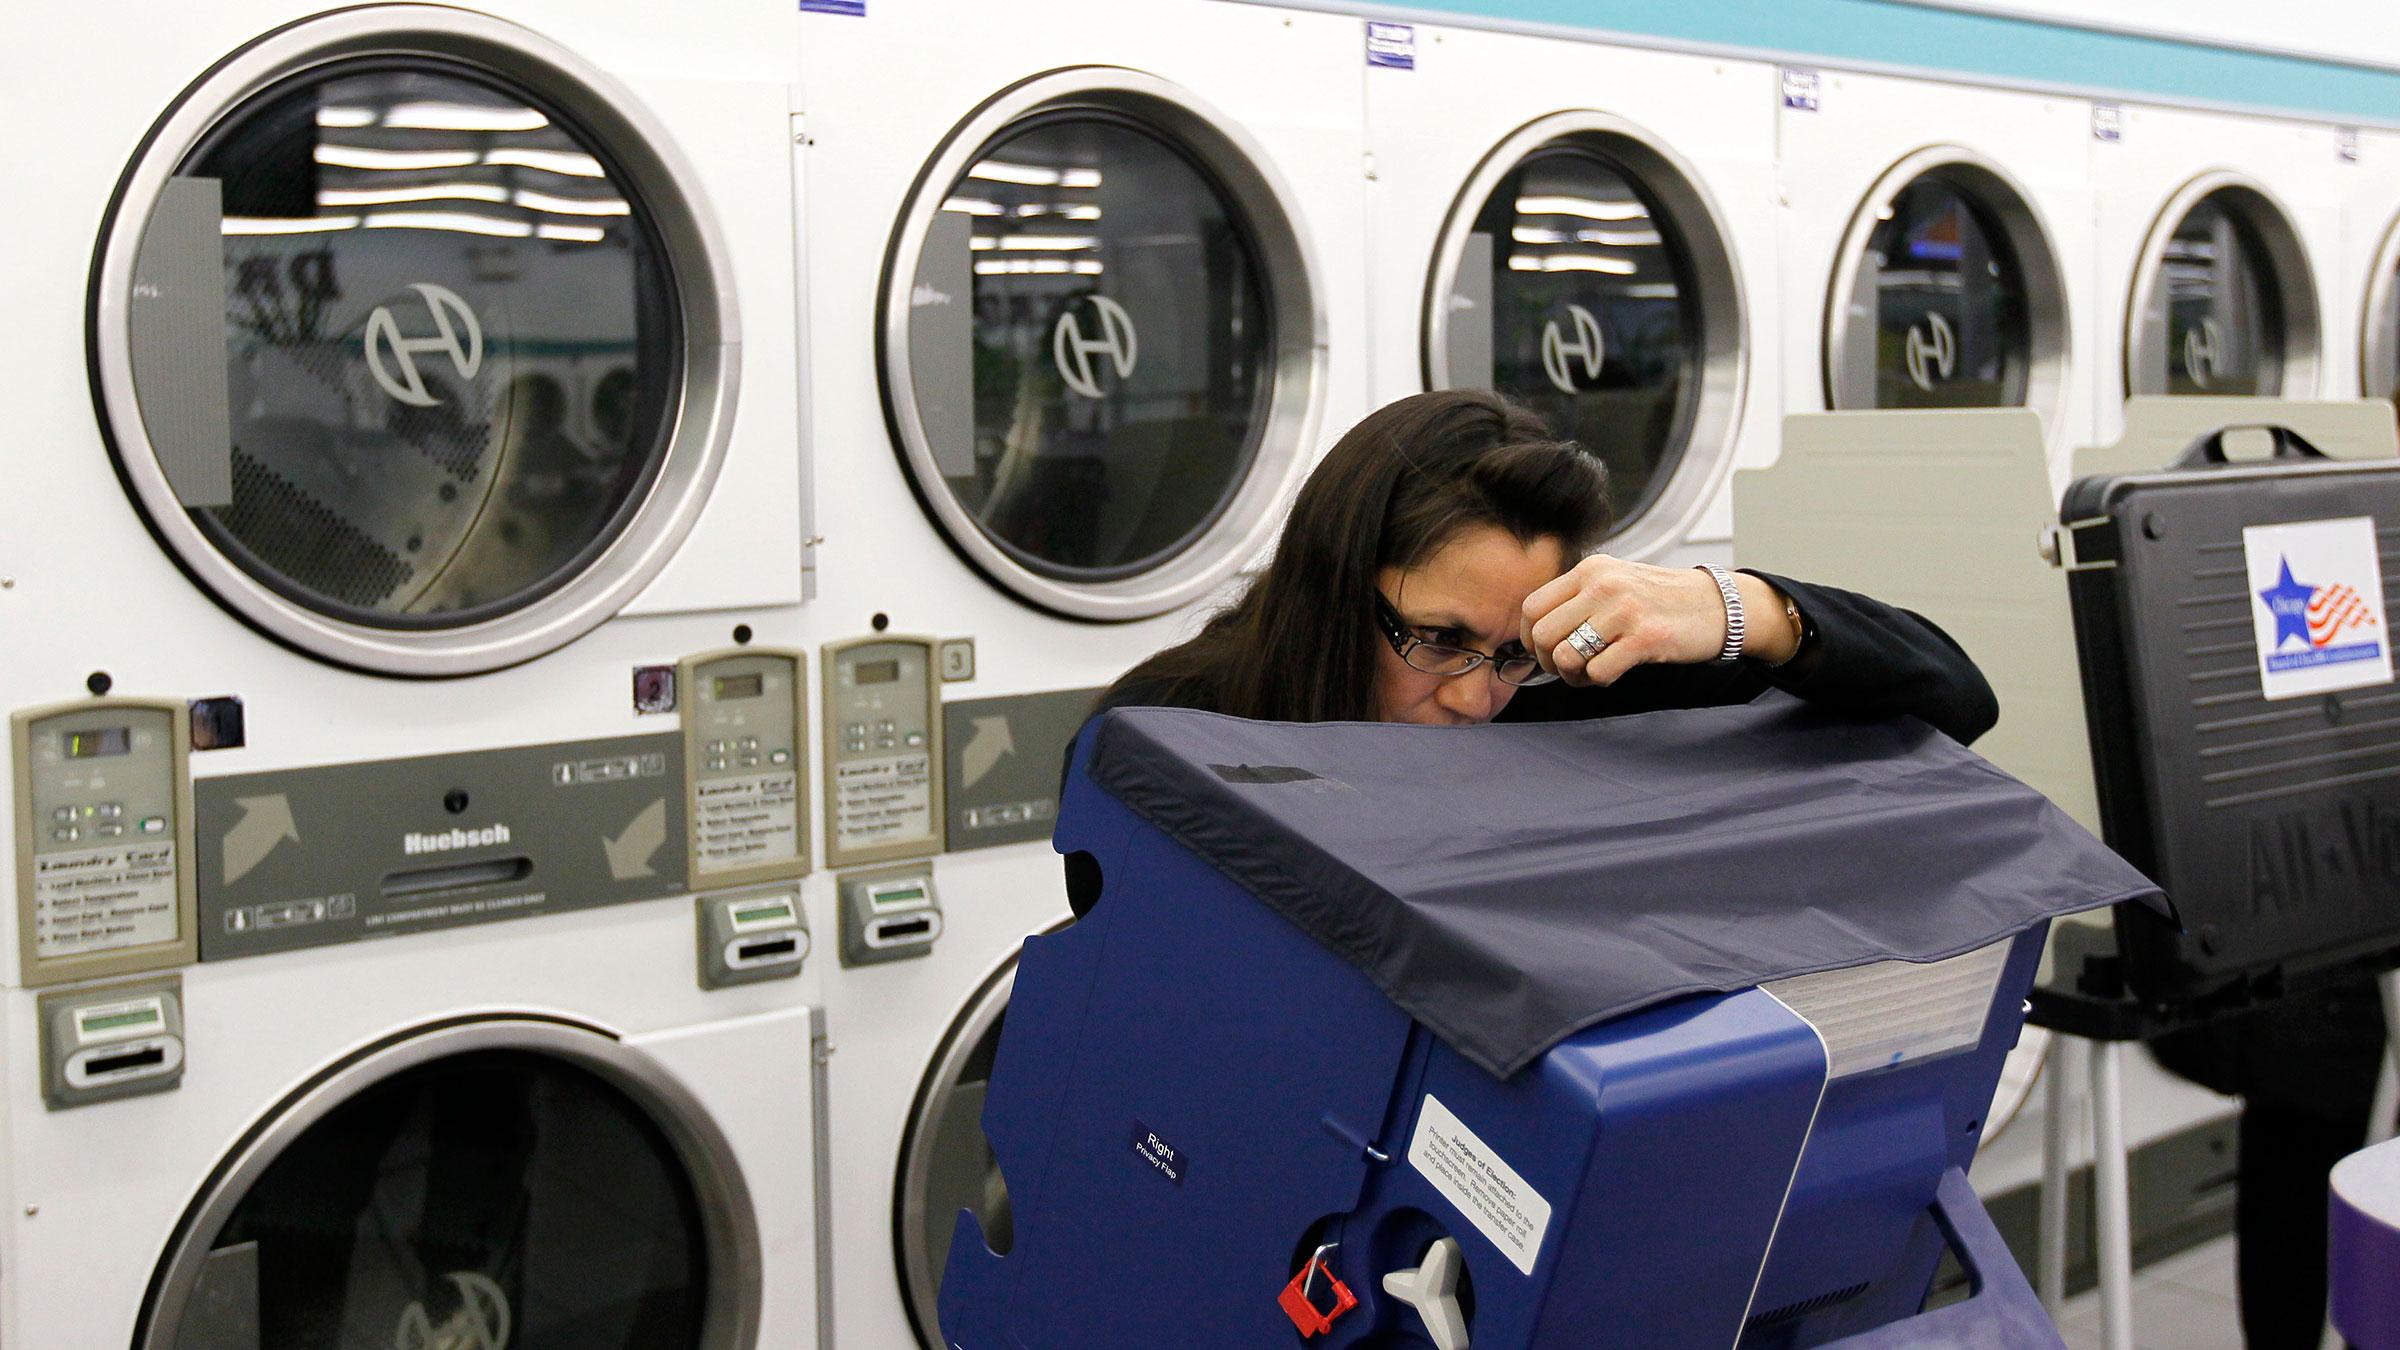 Laundromat voting